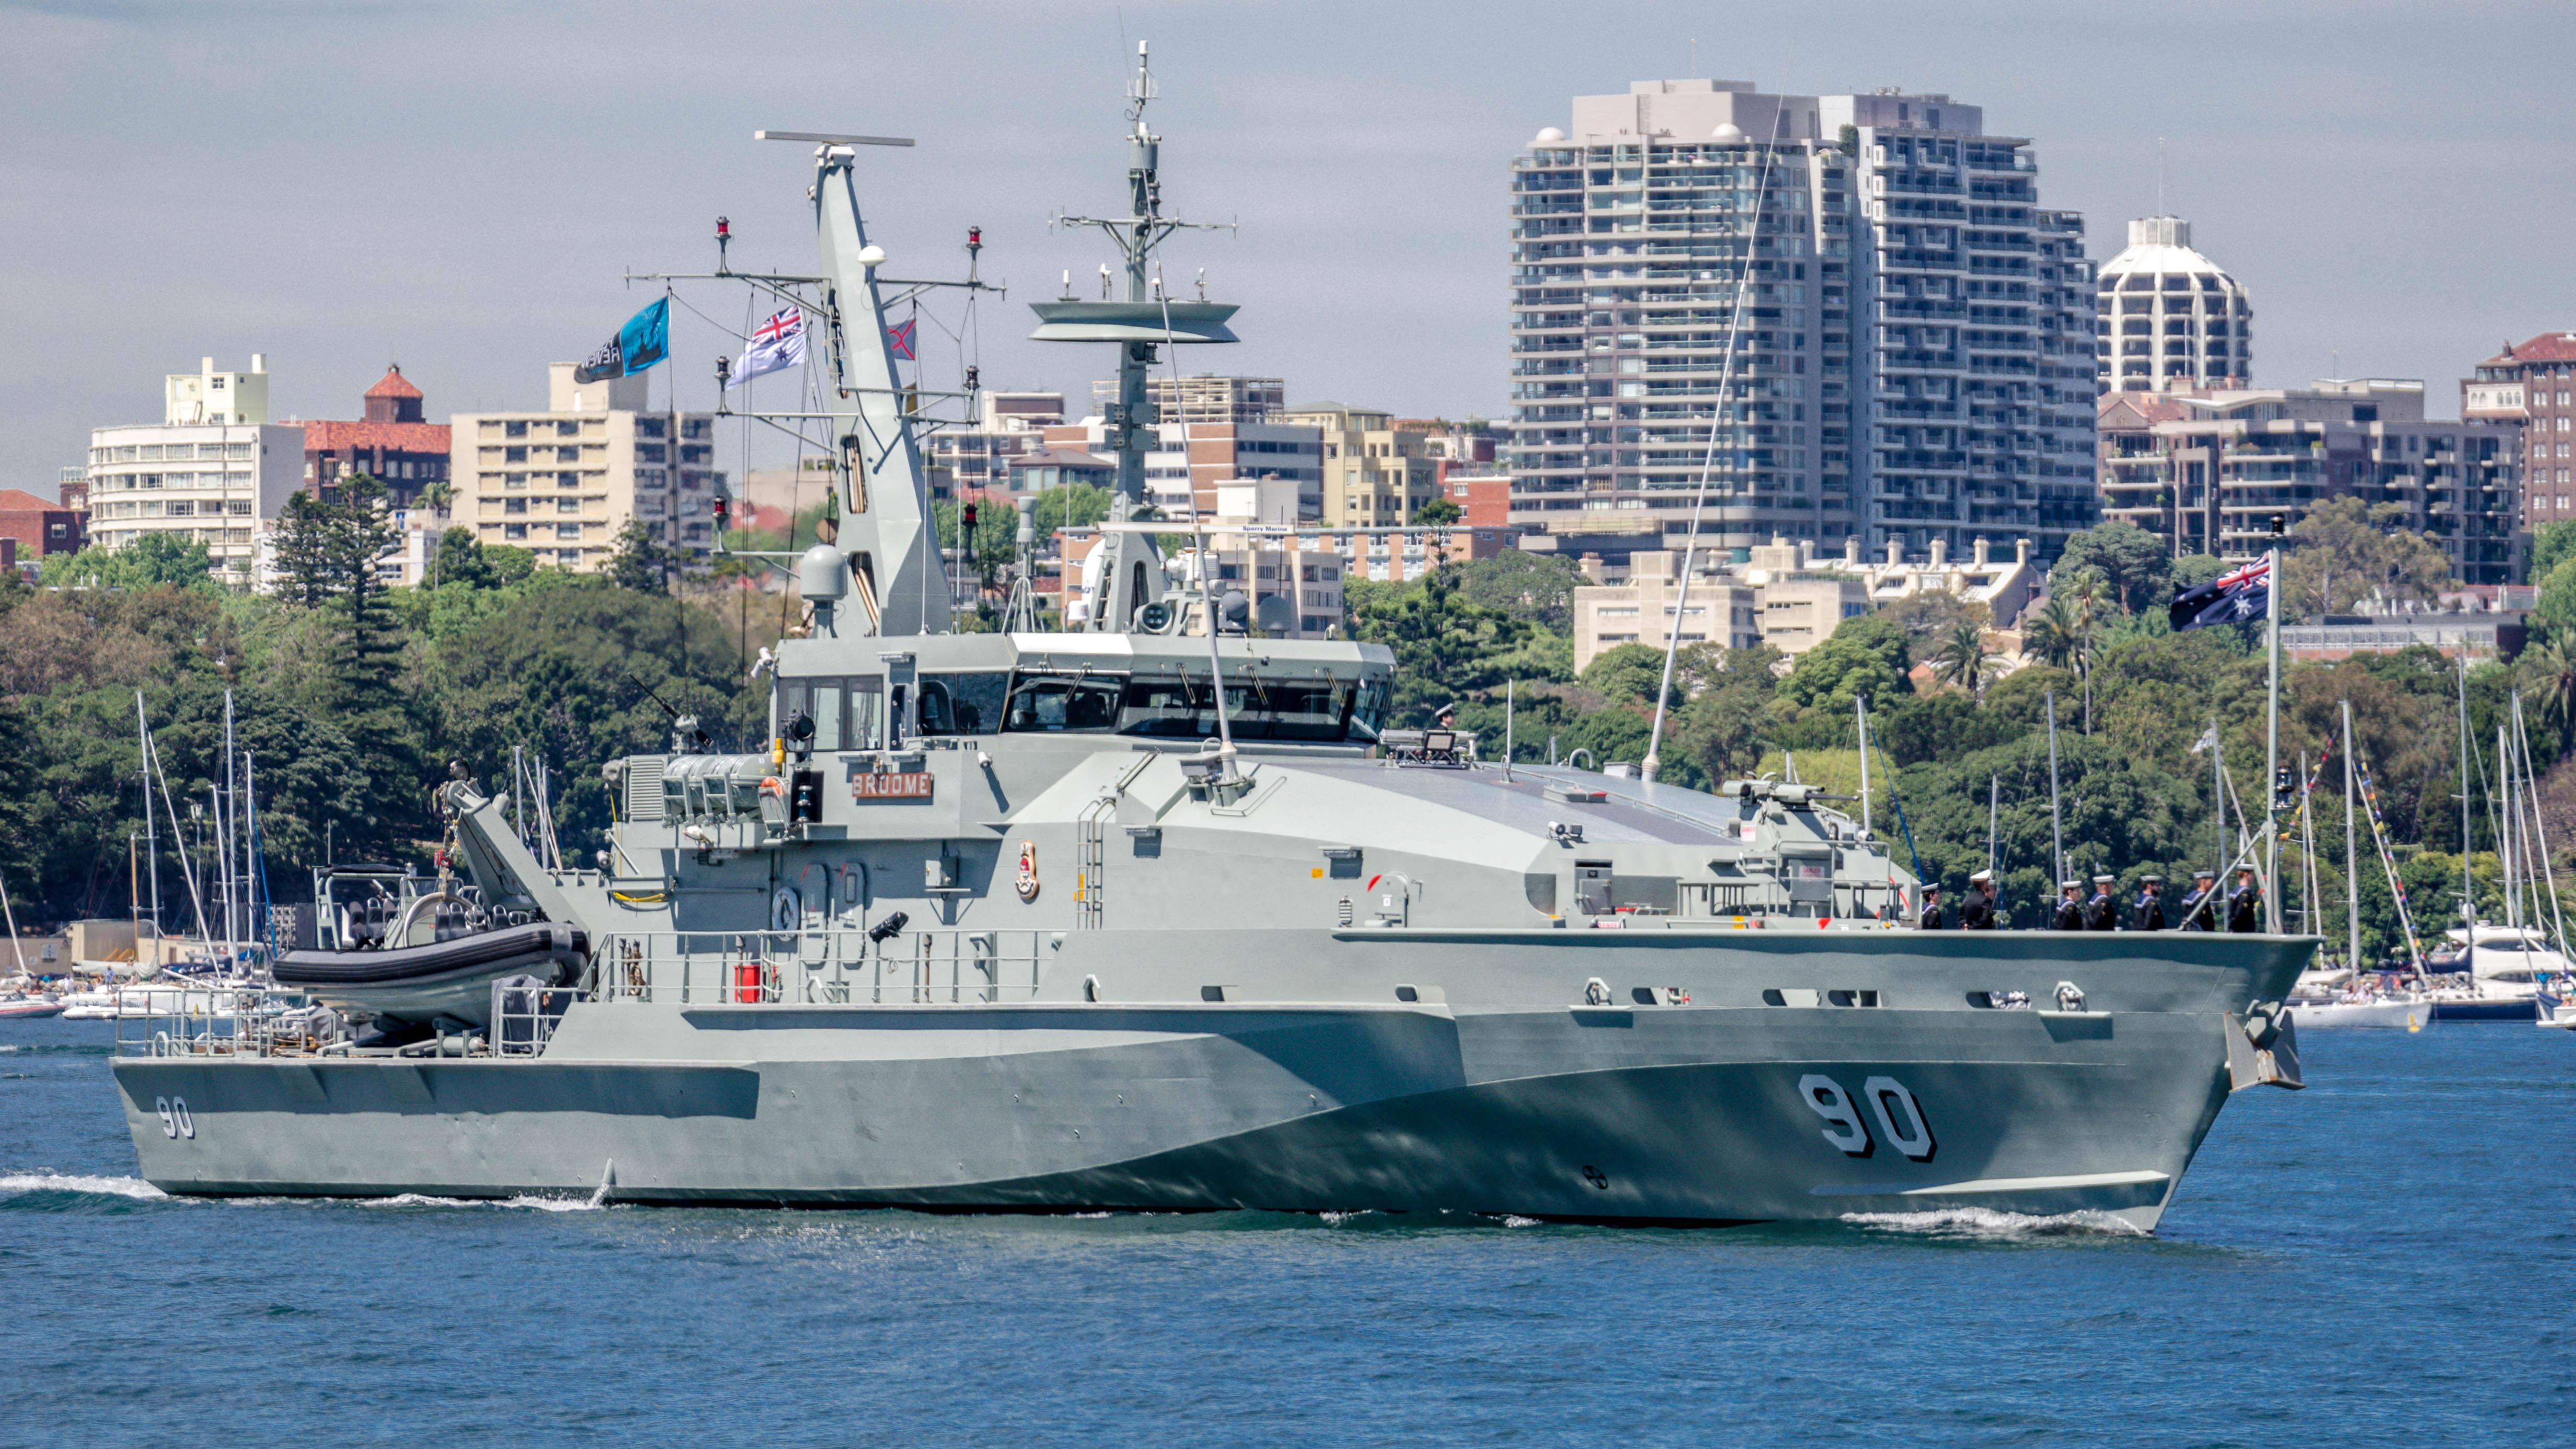 Armidale-class patrol boat - Wikipedia